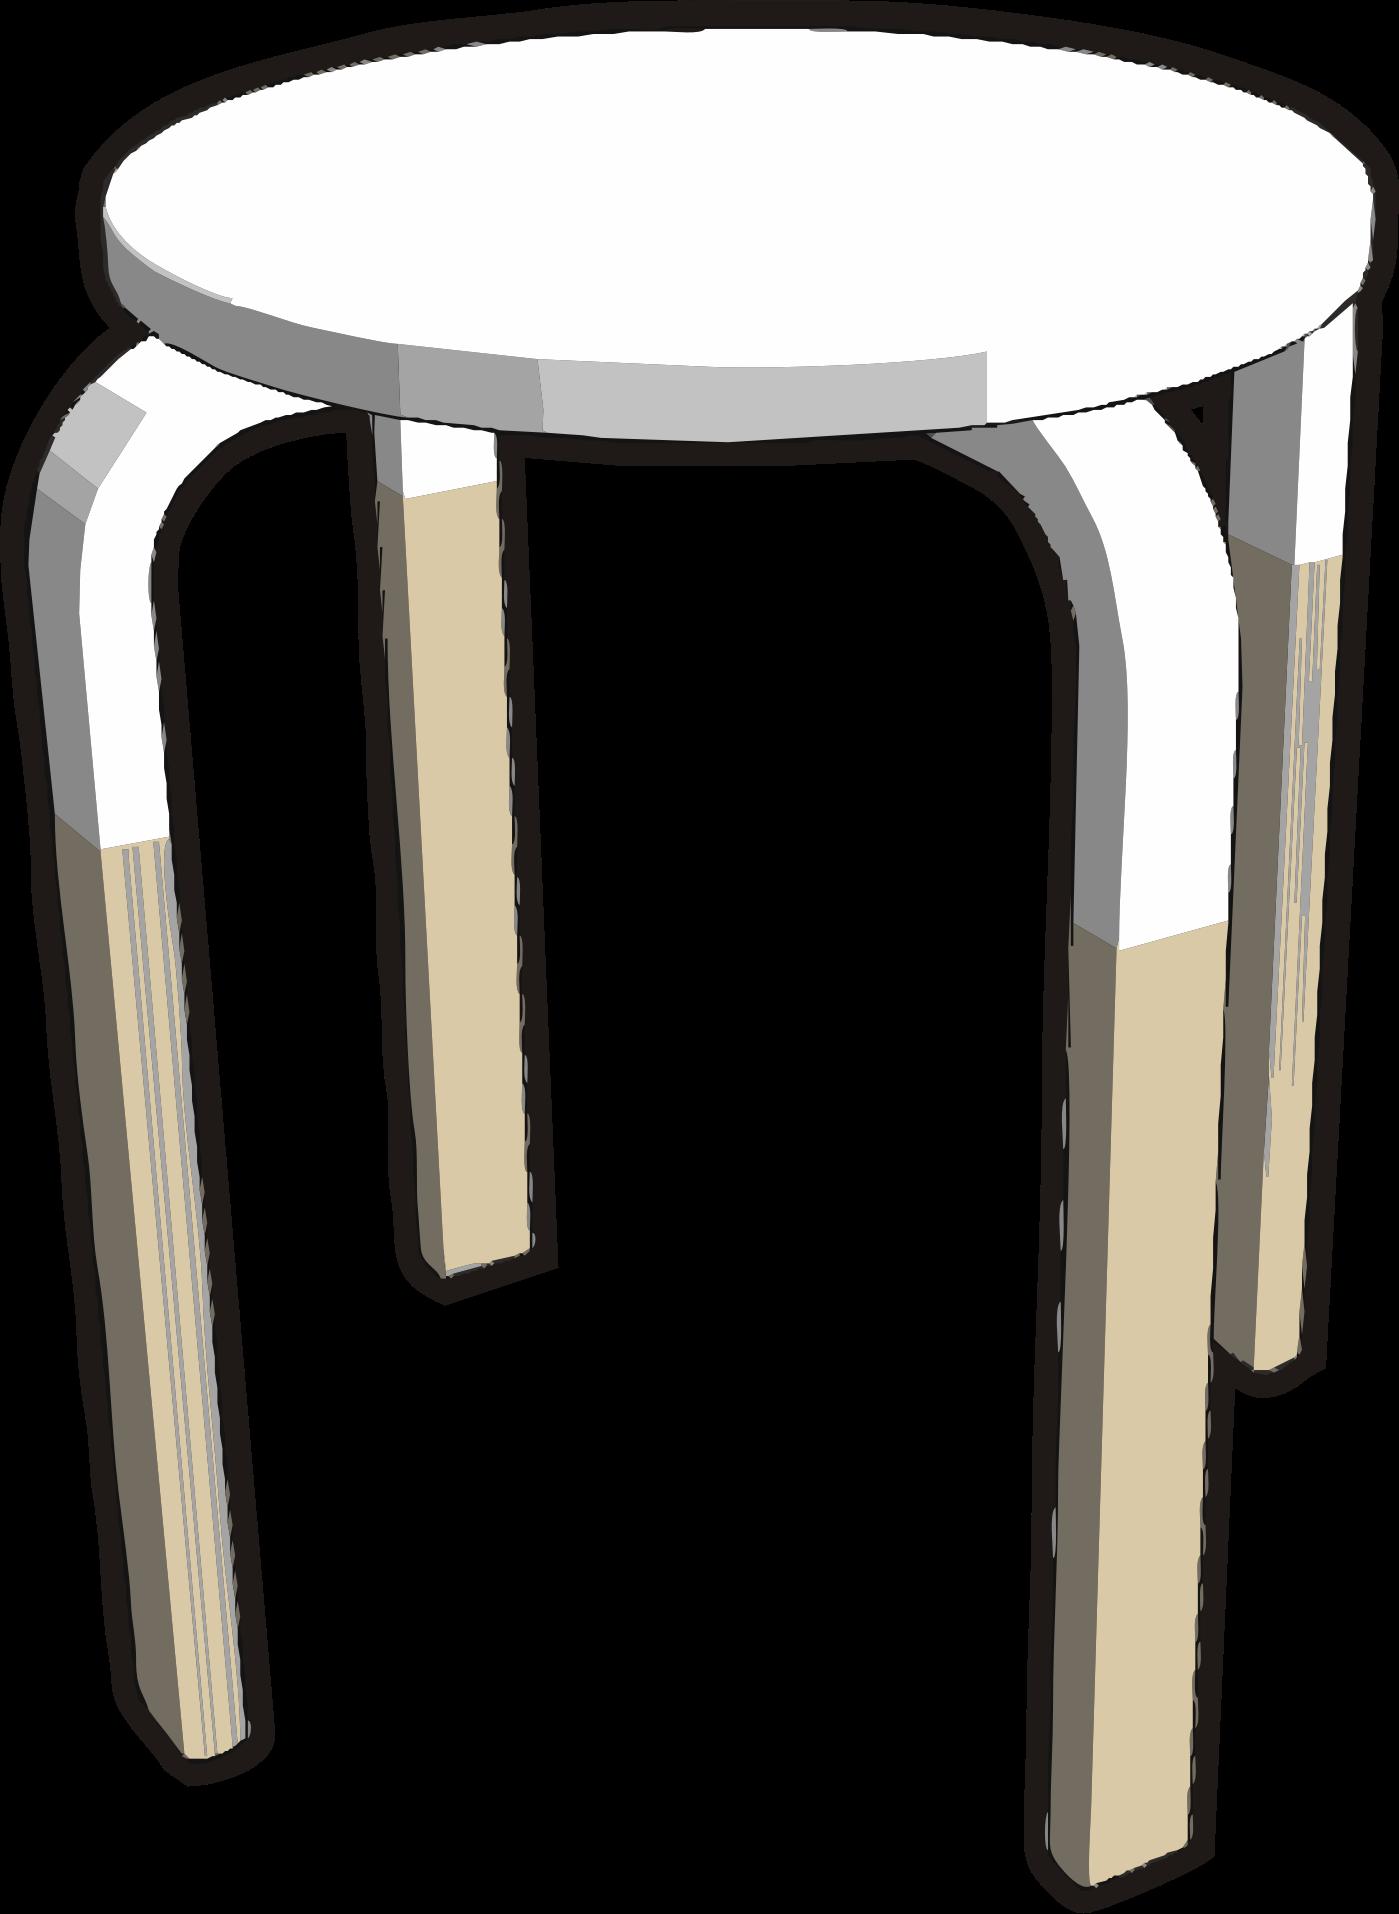 End clipart half Stool Frosta Clipart stool stuff